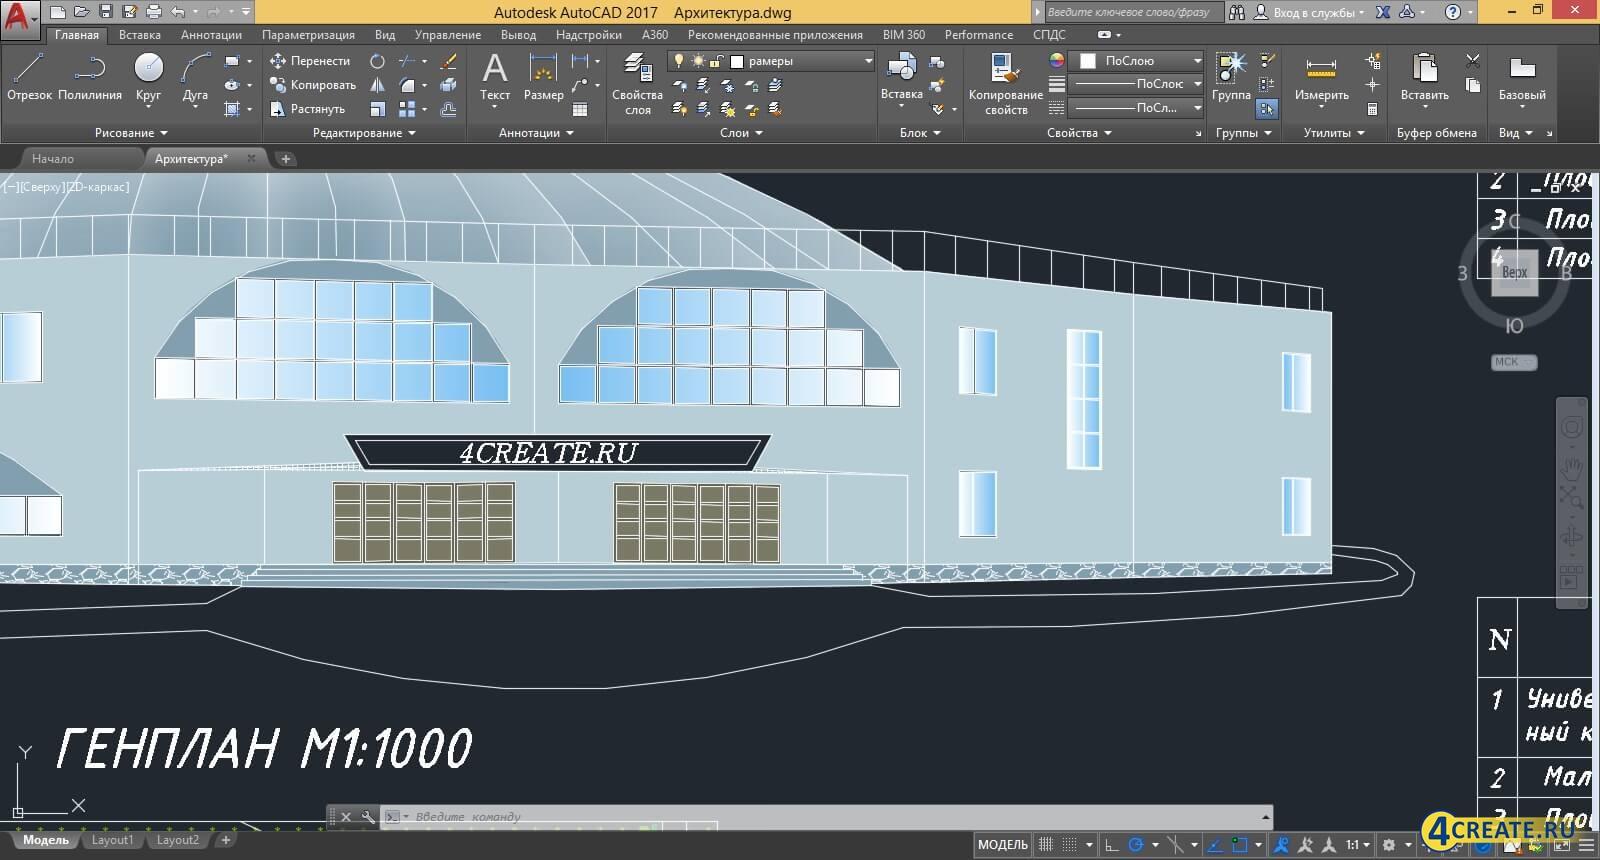 AutoCAD 2017 (Скриншот 1)